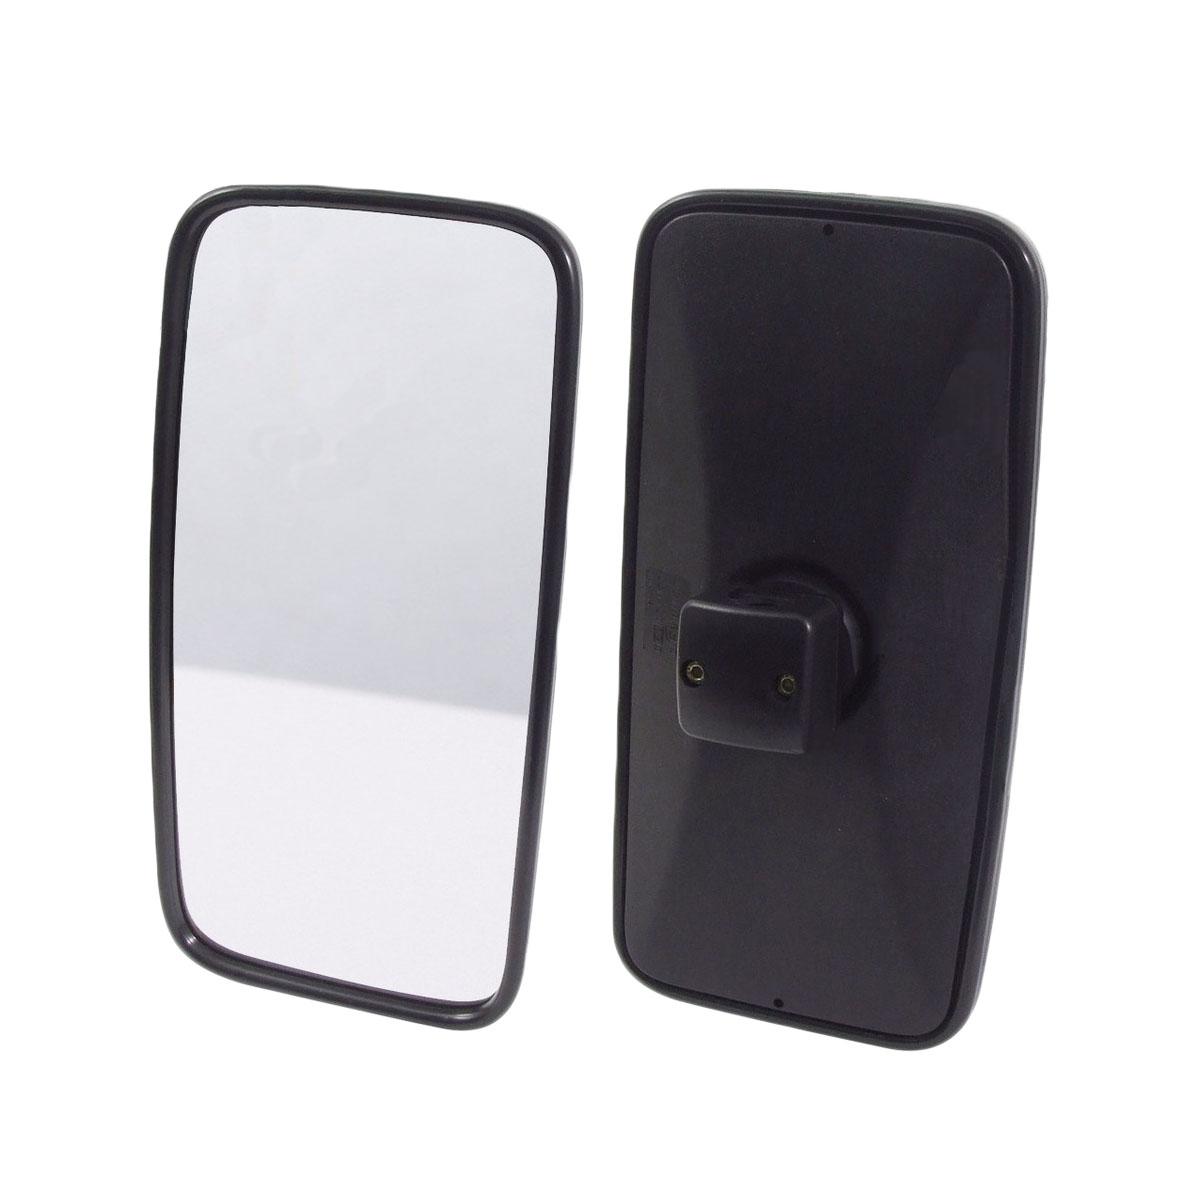 Espelho Retrovisor Mb Axor Atego Manual Vidro Plano - 36X19 Cm